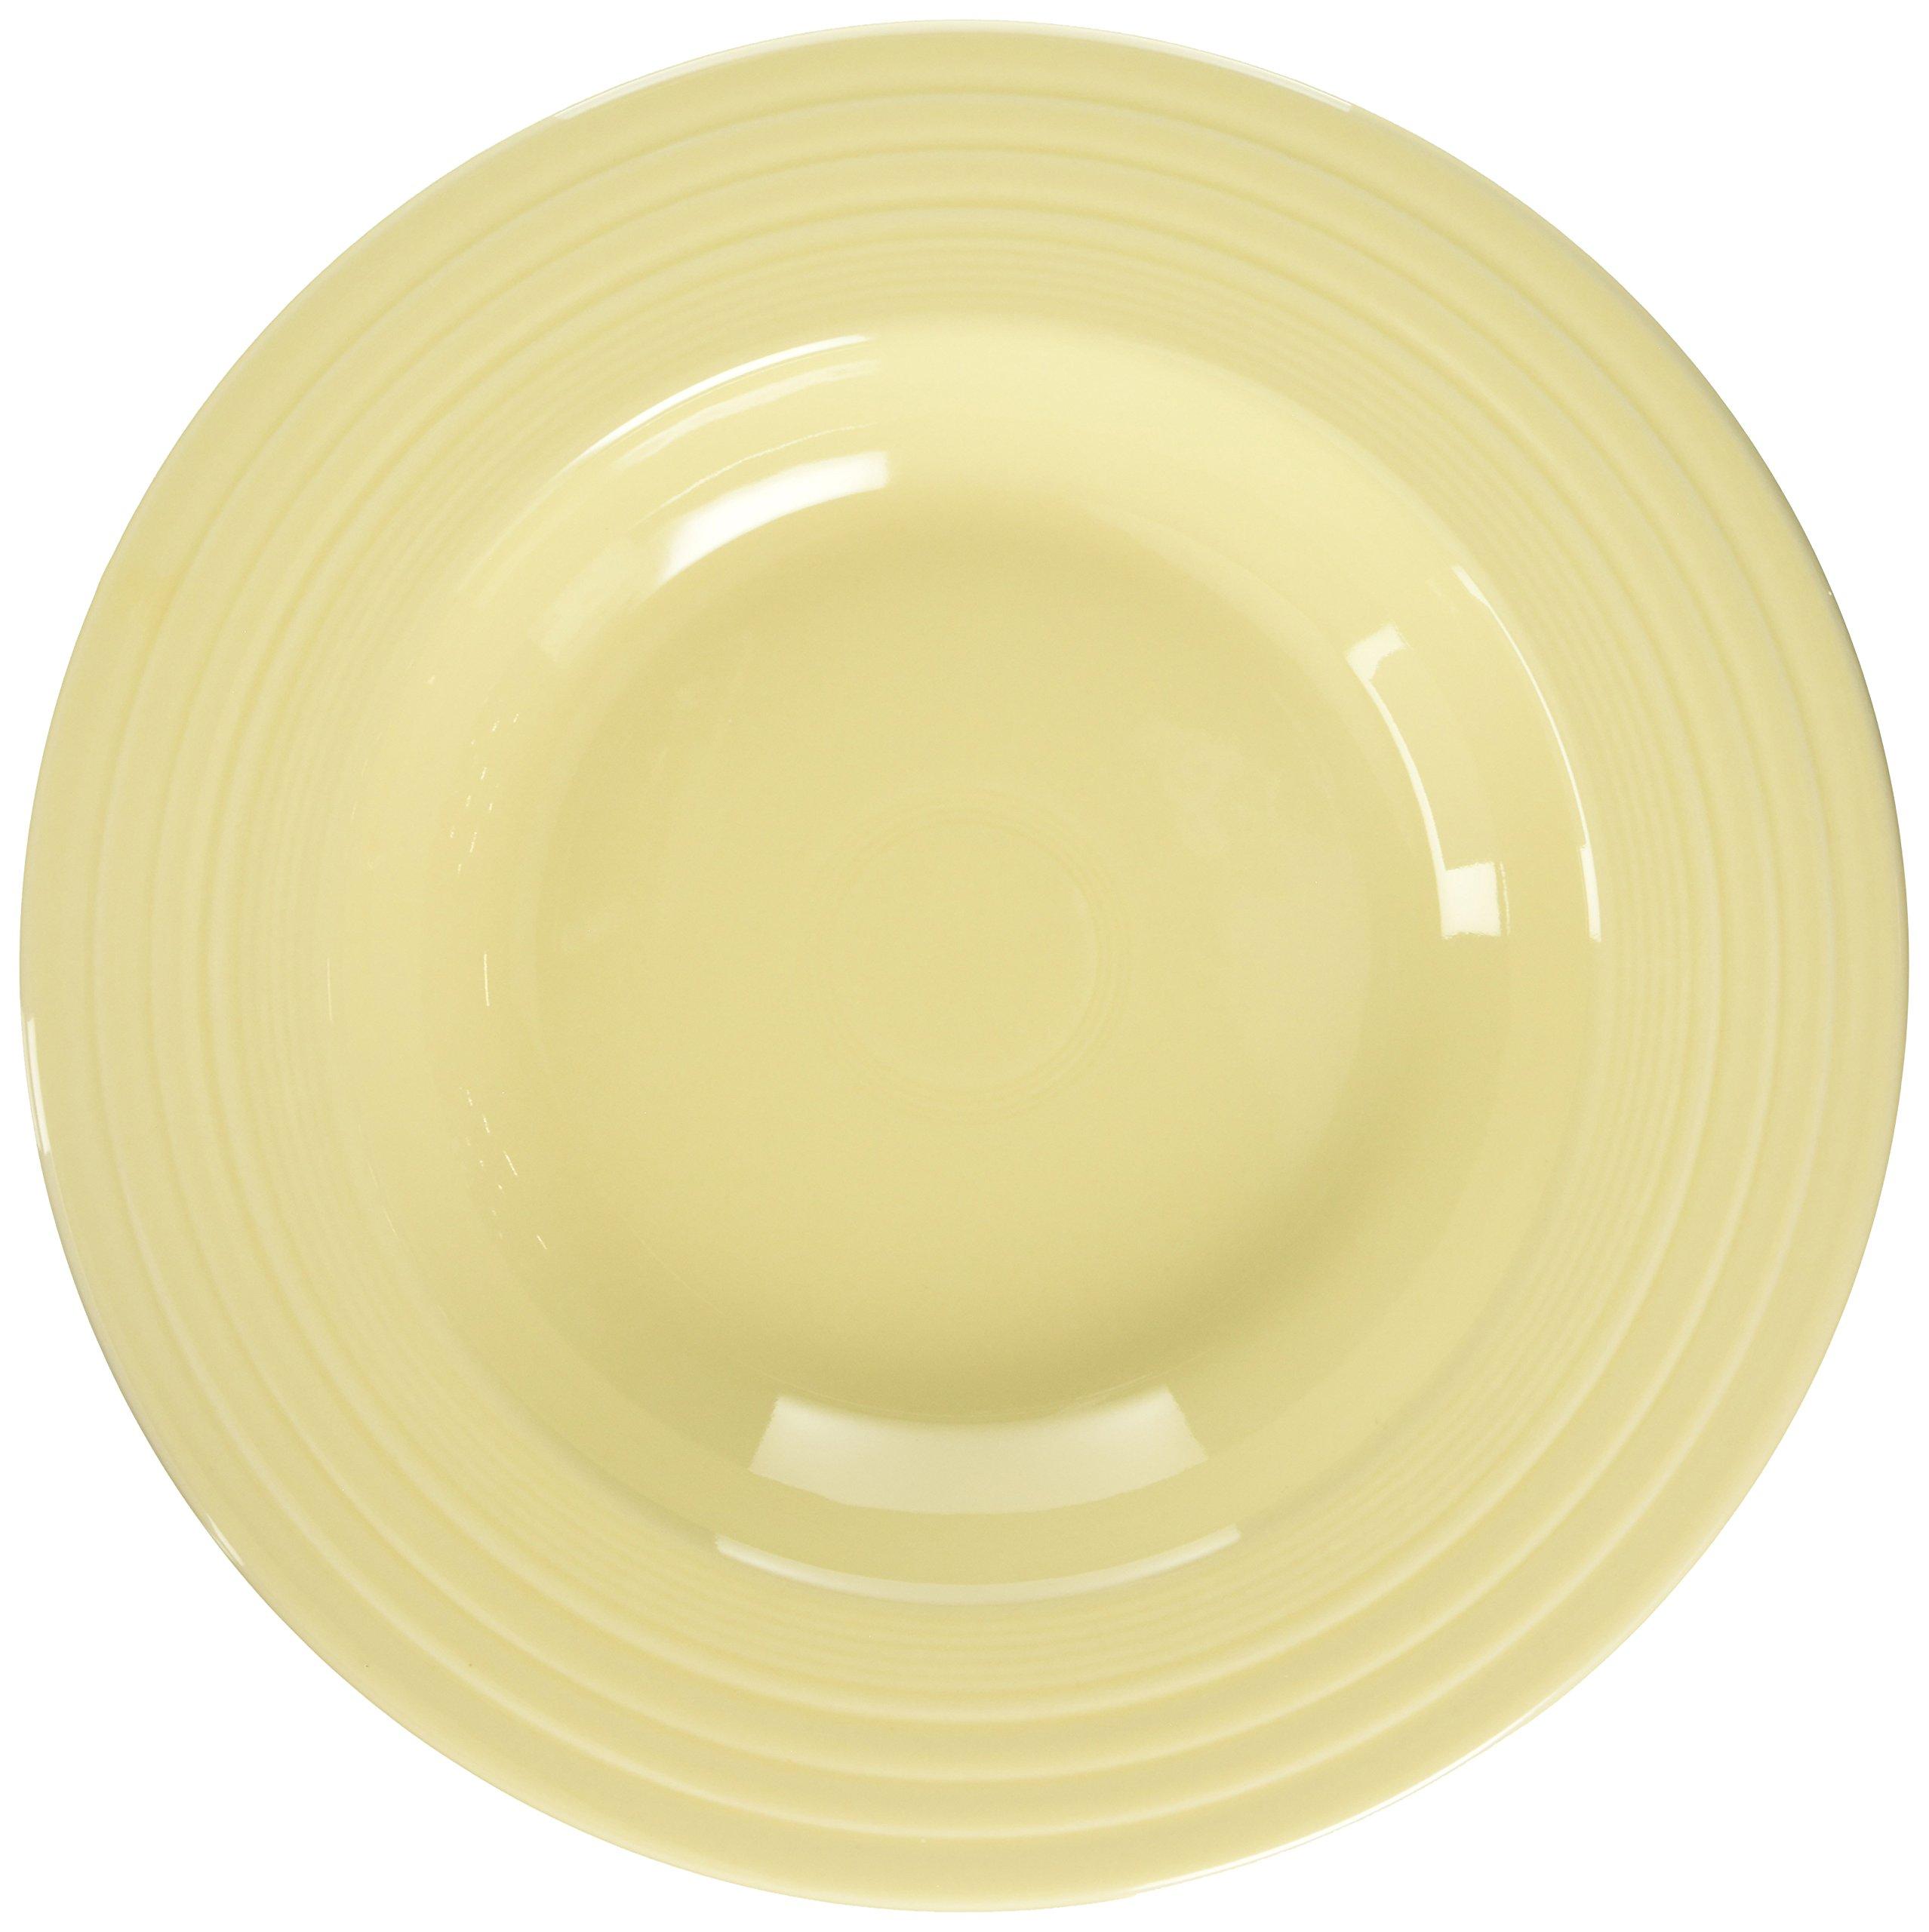 Fiesta 12-Inch Pasta Bowl, Ivory